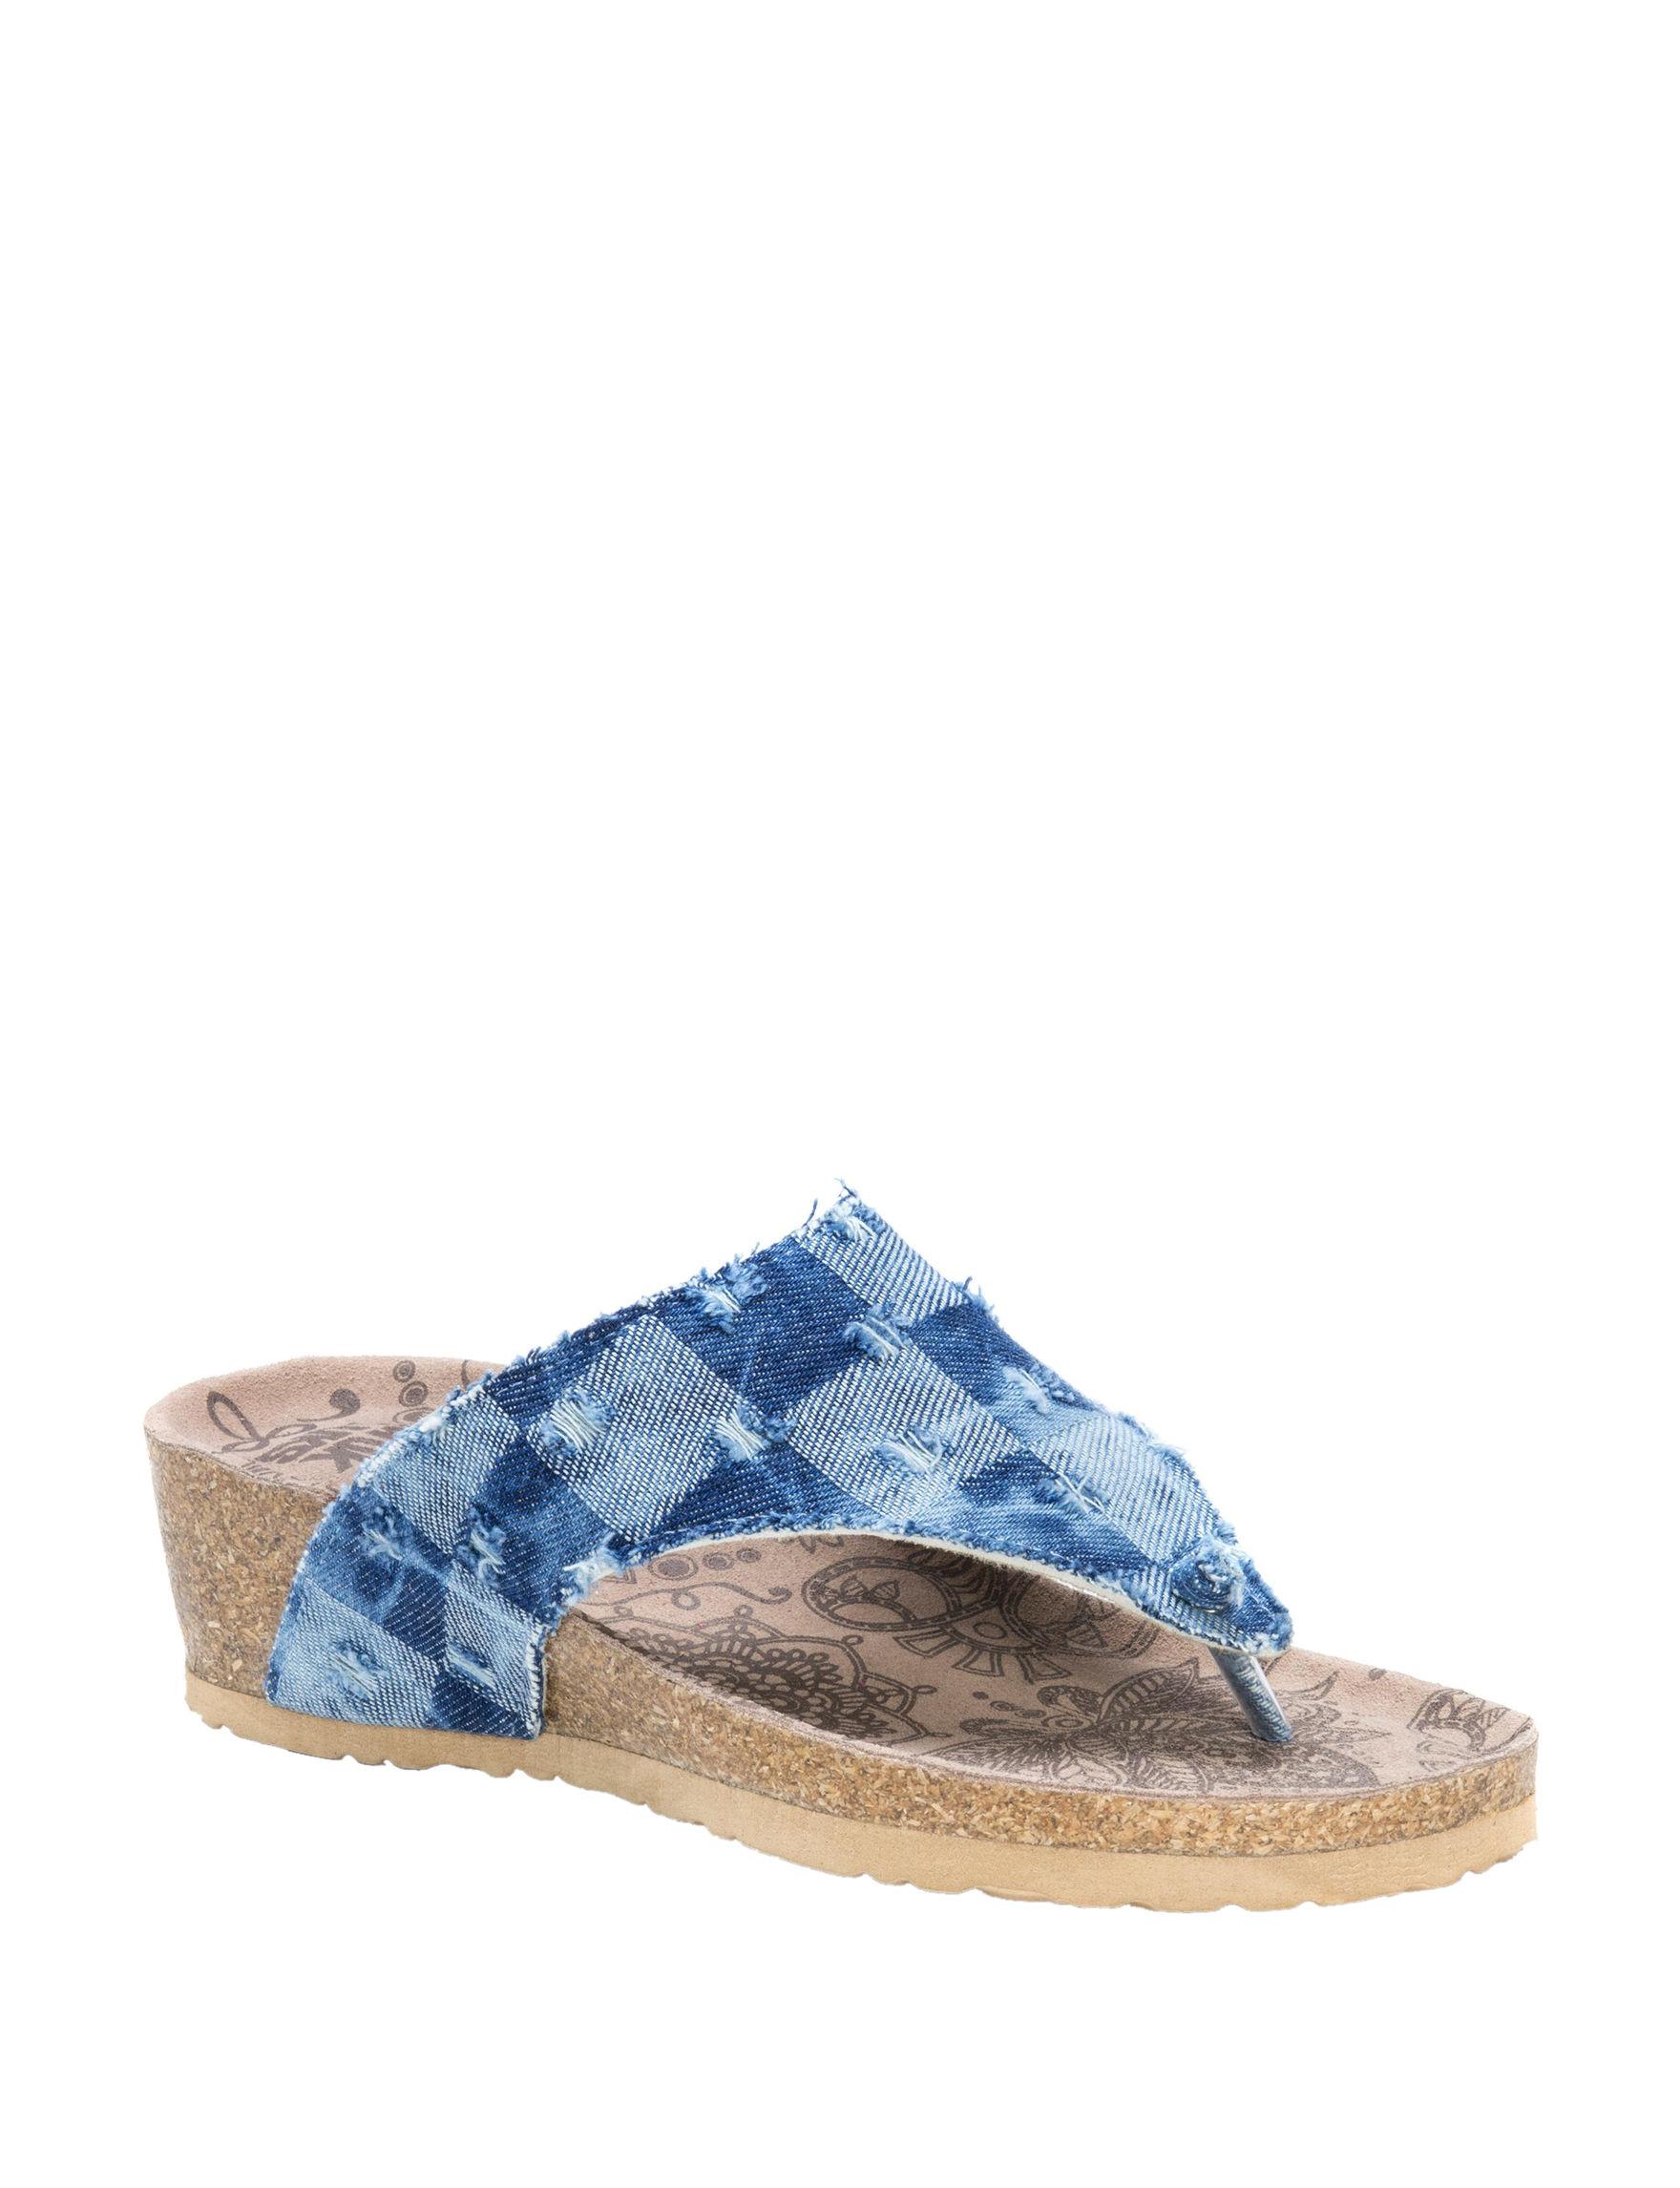 Muk Luks Blue Wedge Sandals